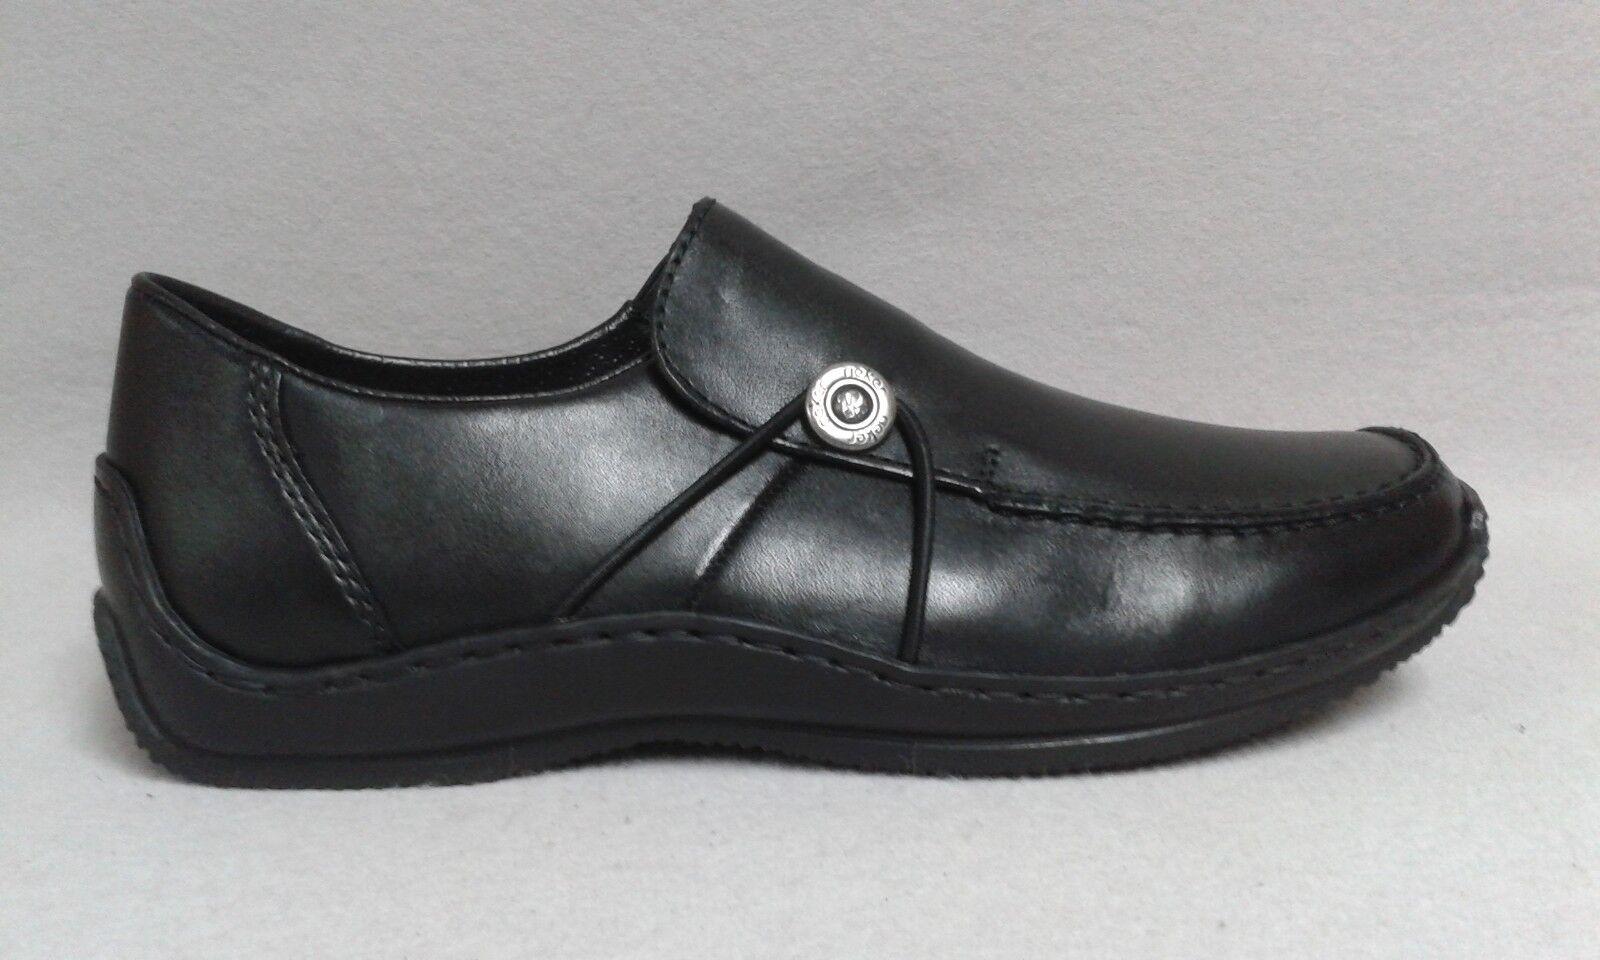 Rieker Slipper schwarz echt Leder sportlich bequem gepolstert Gummizug 0246 3